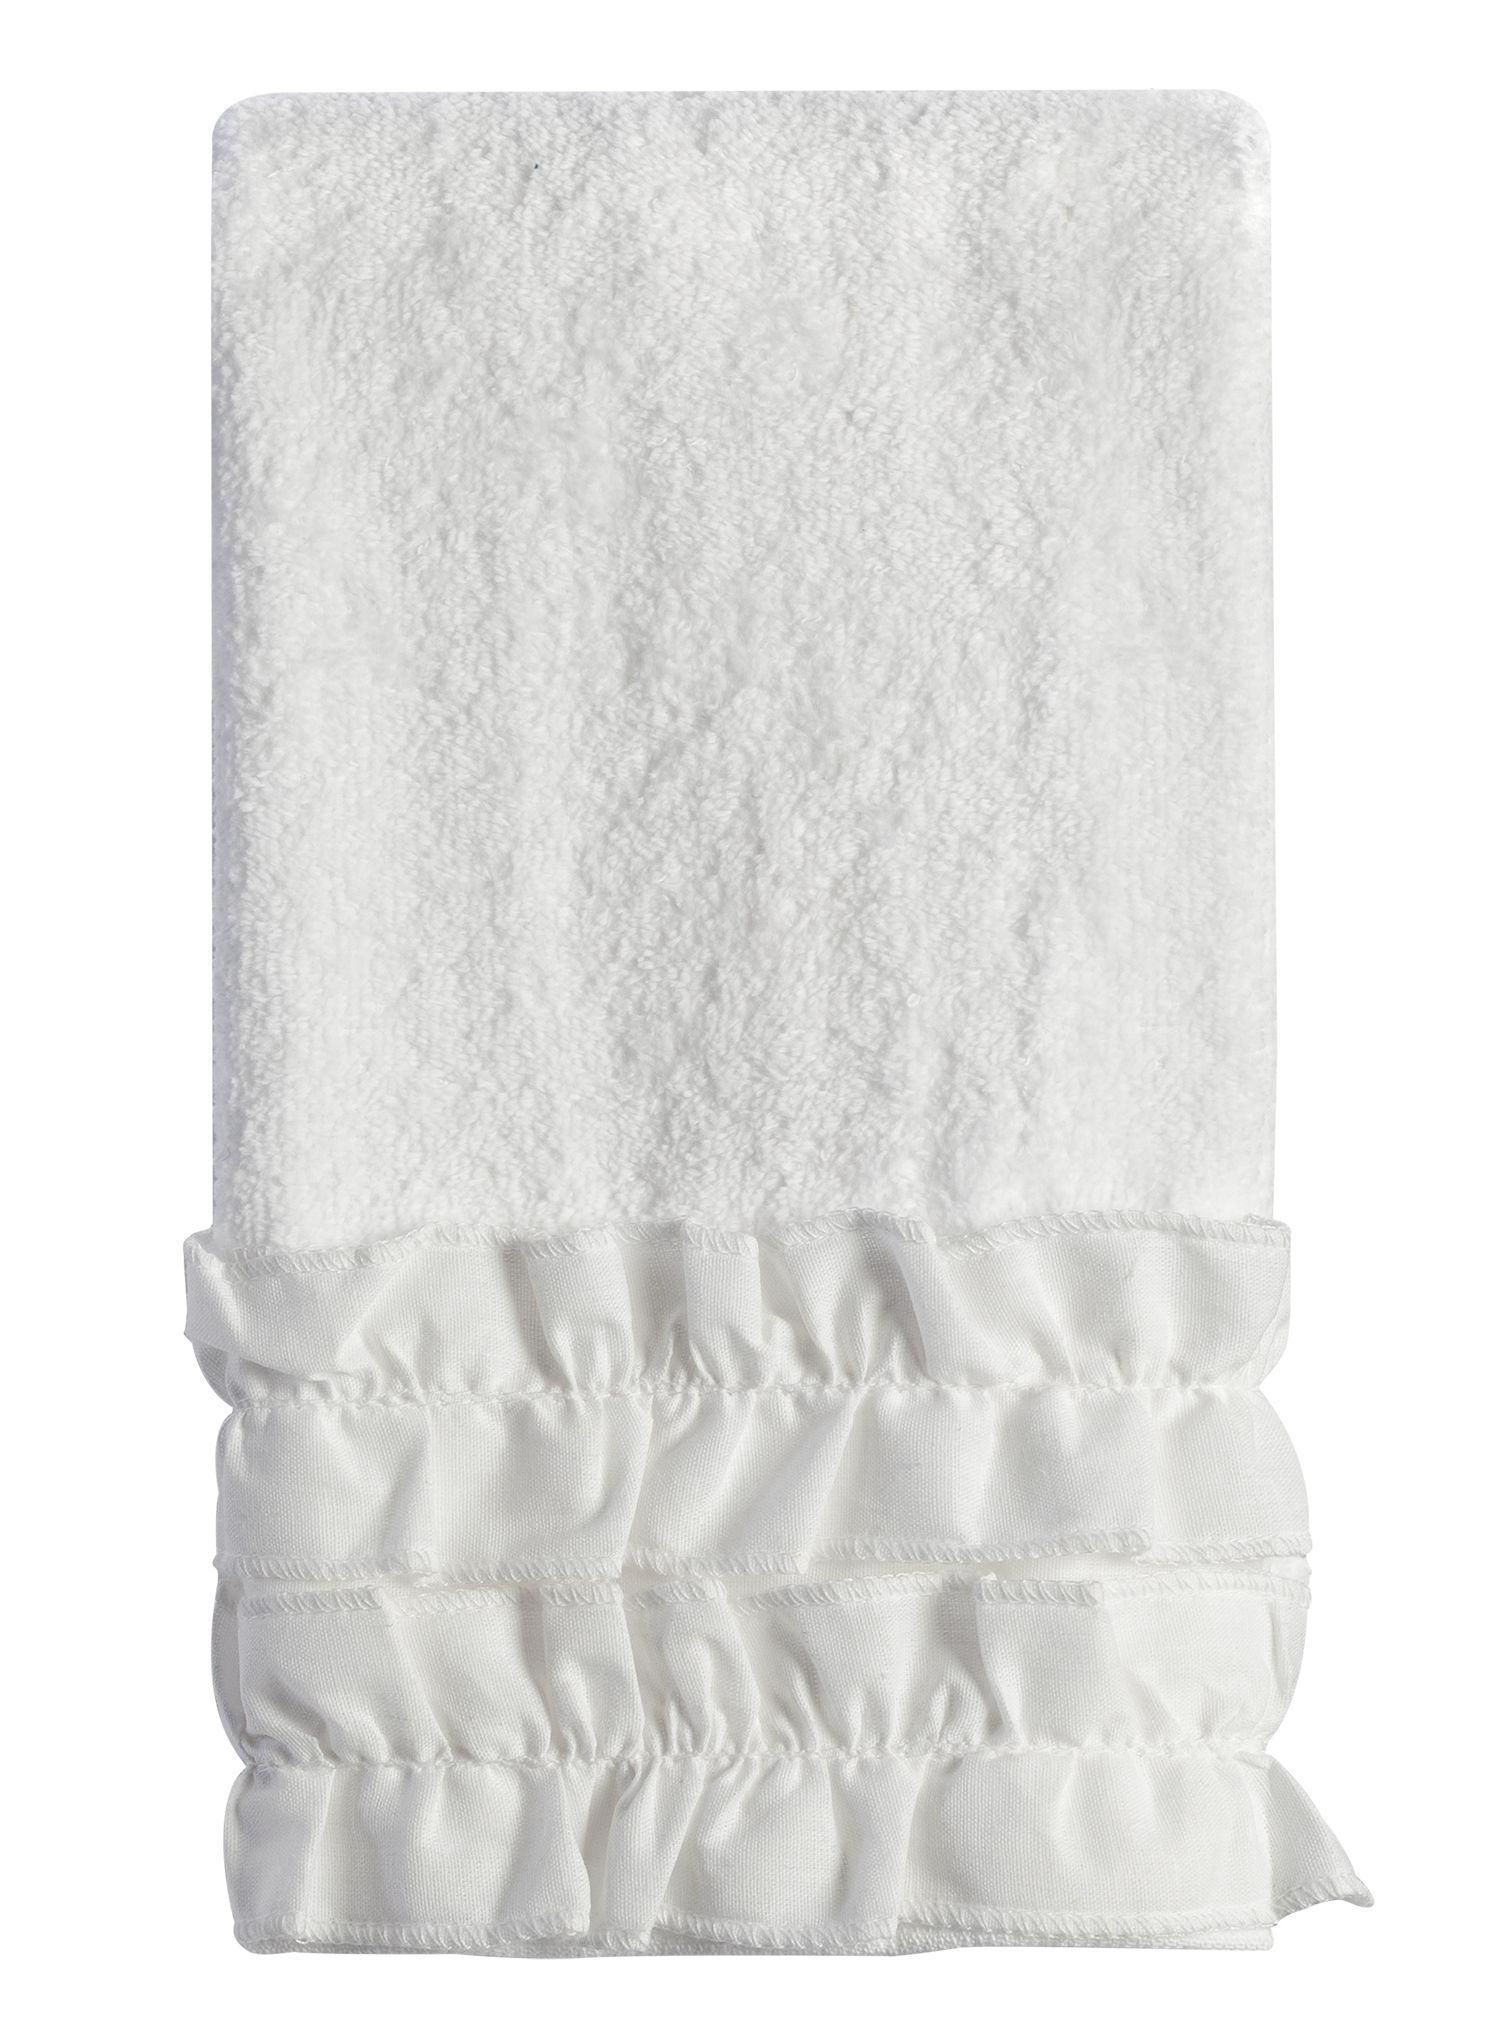 Полотенце 27х42 Creative Bath Ruffles белое